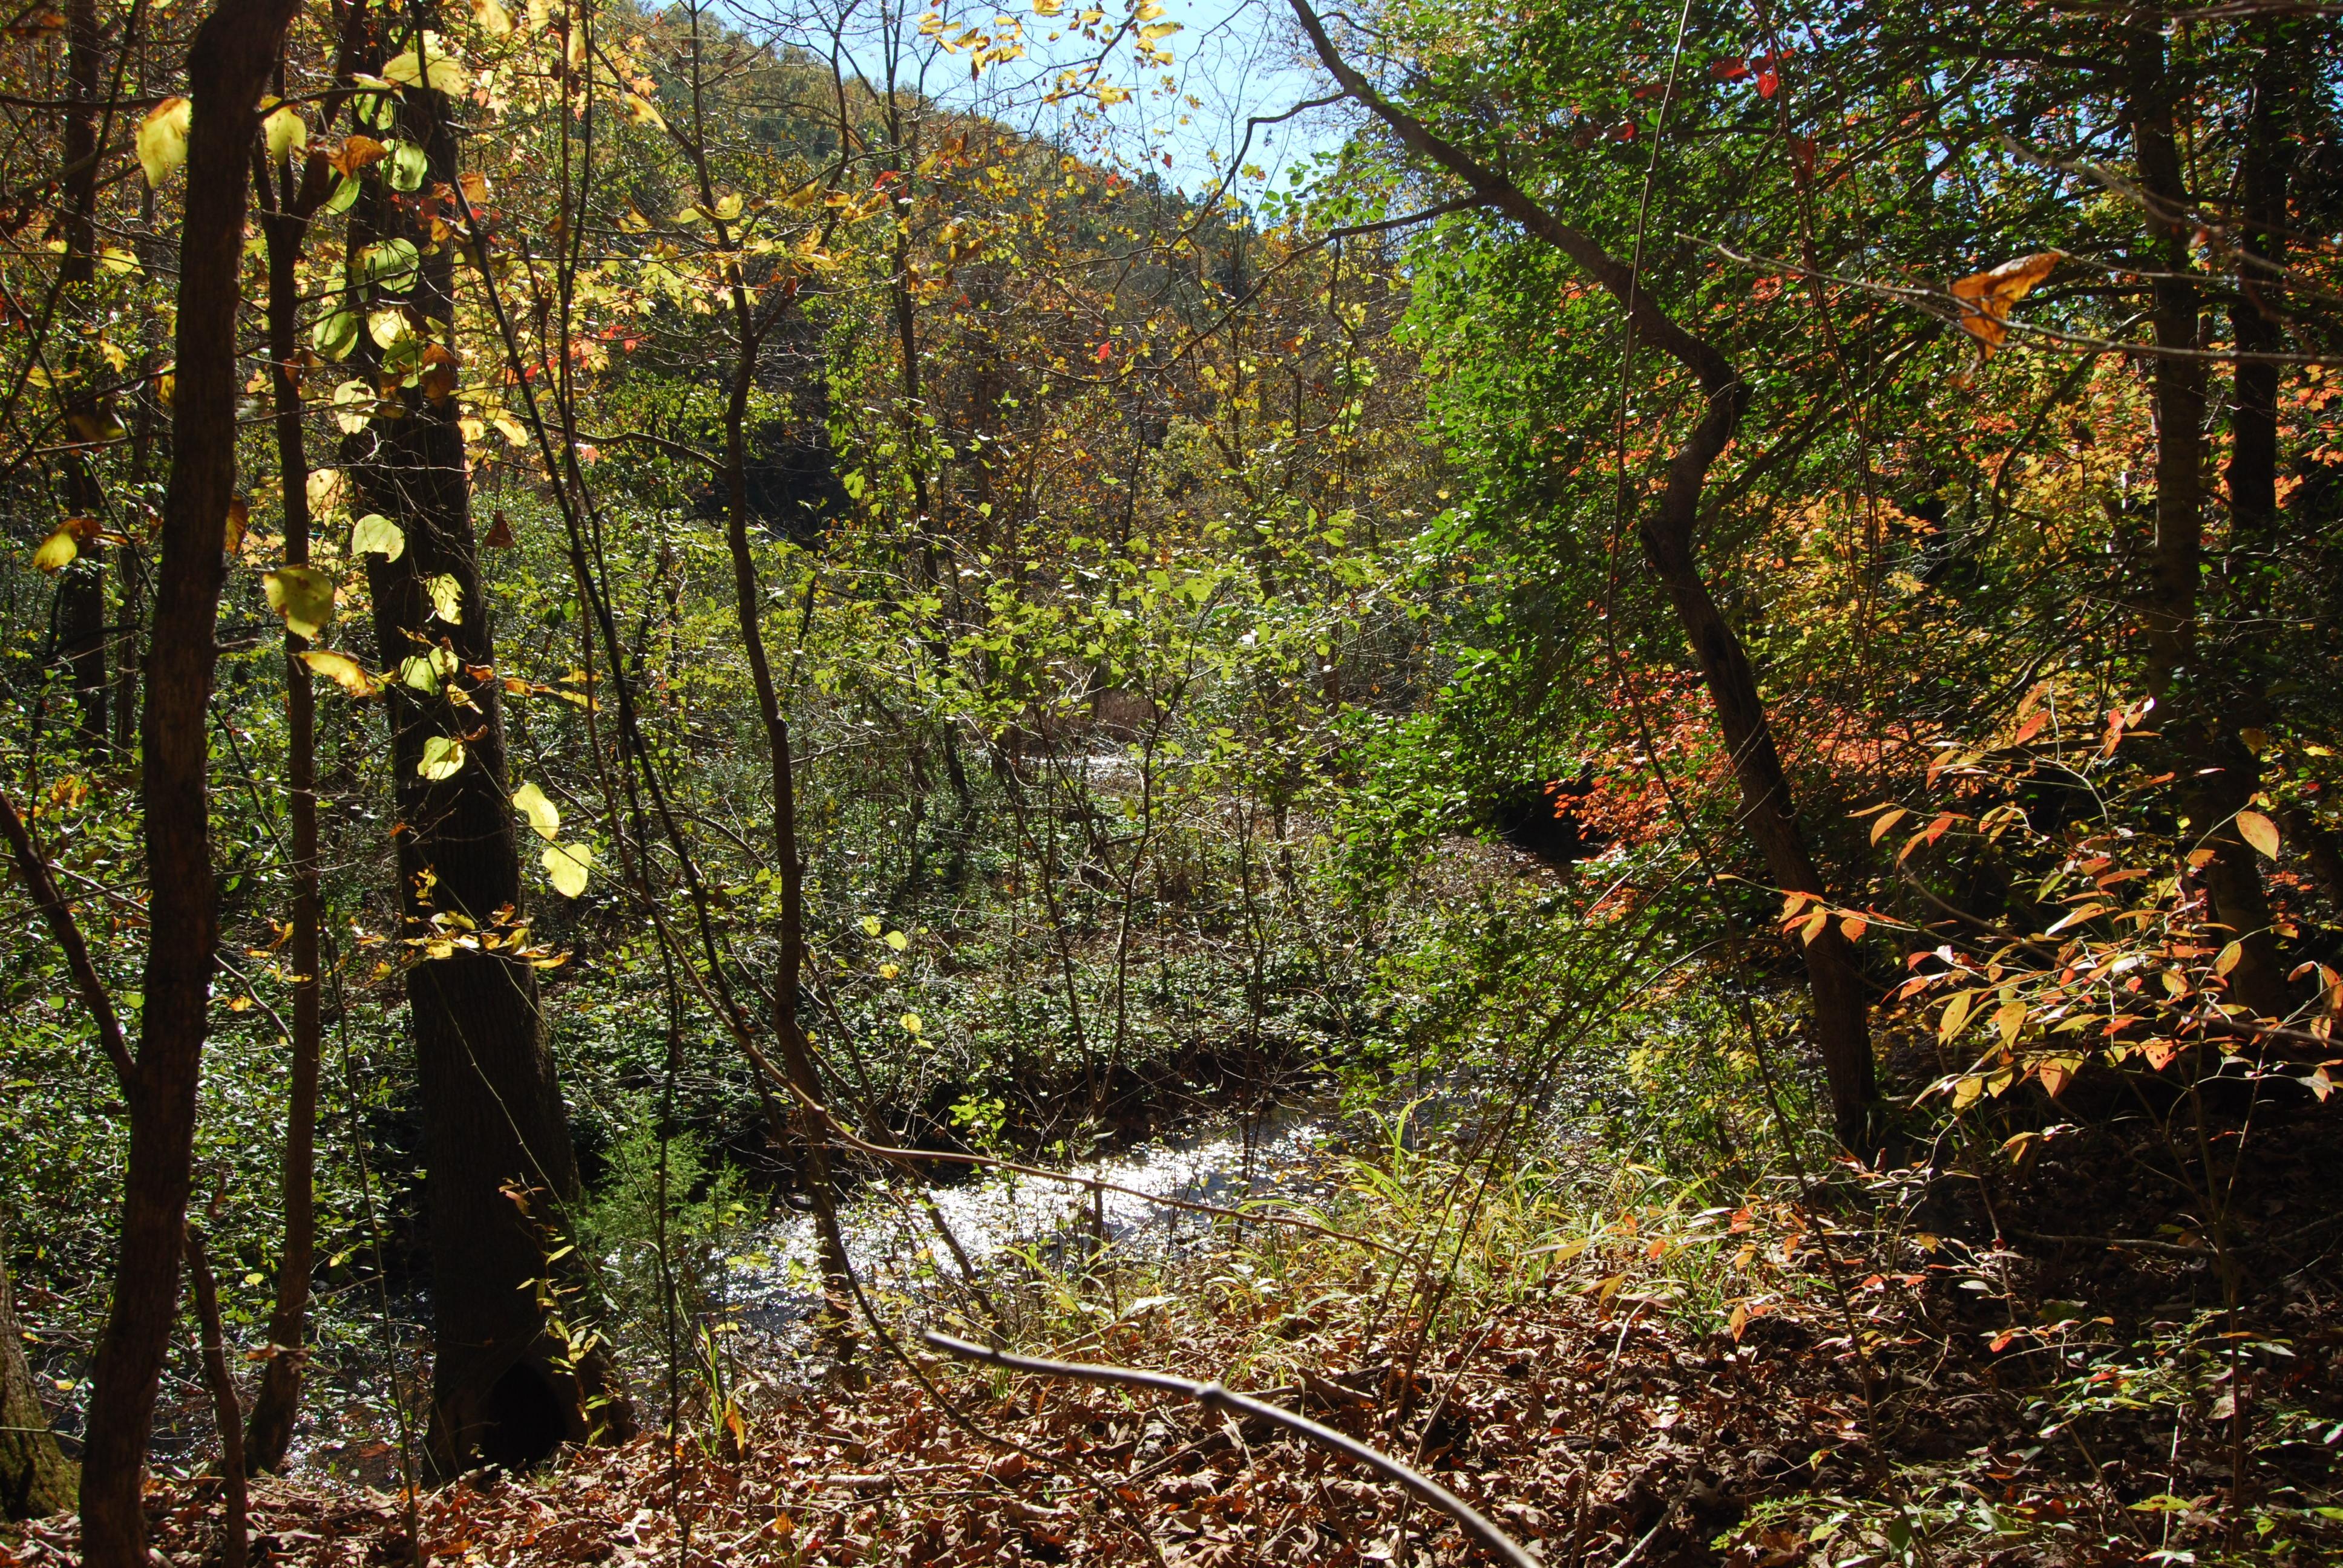 On the Jones Valley Logging Road